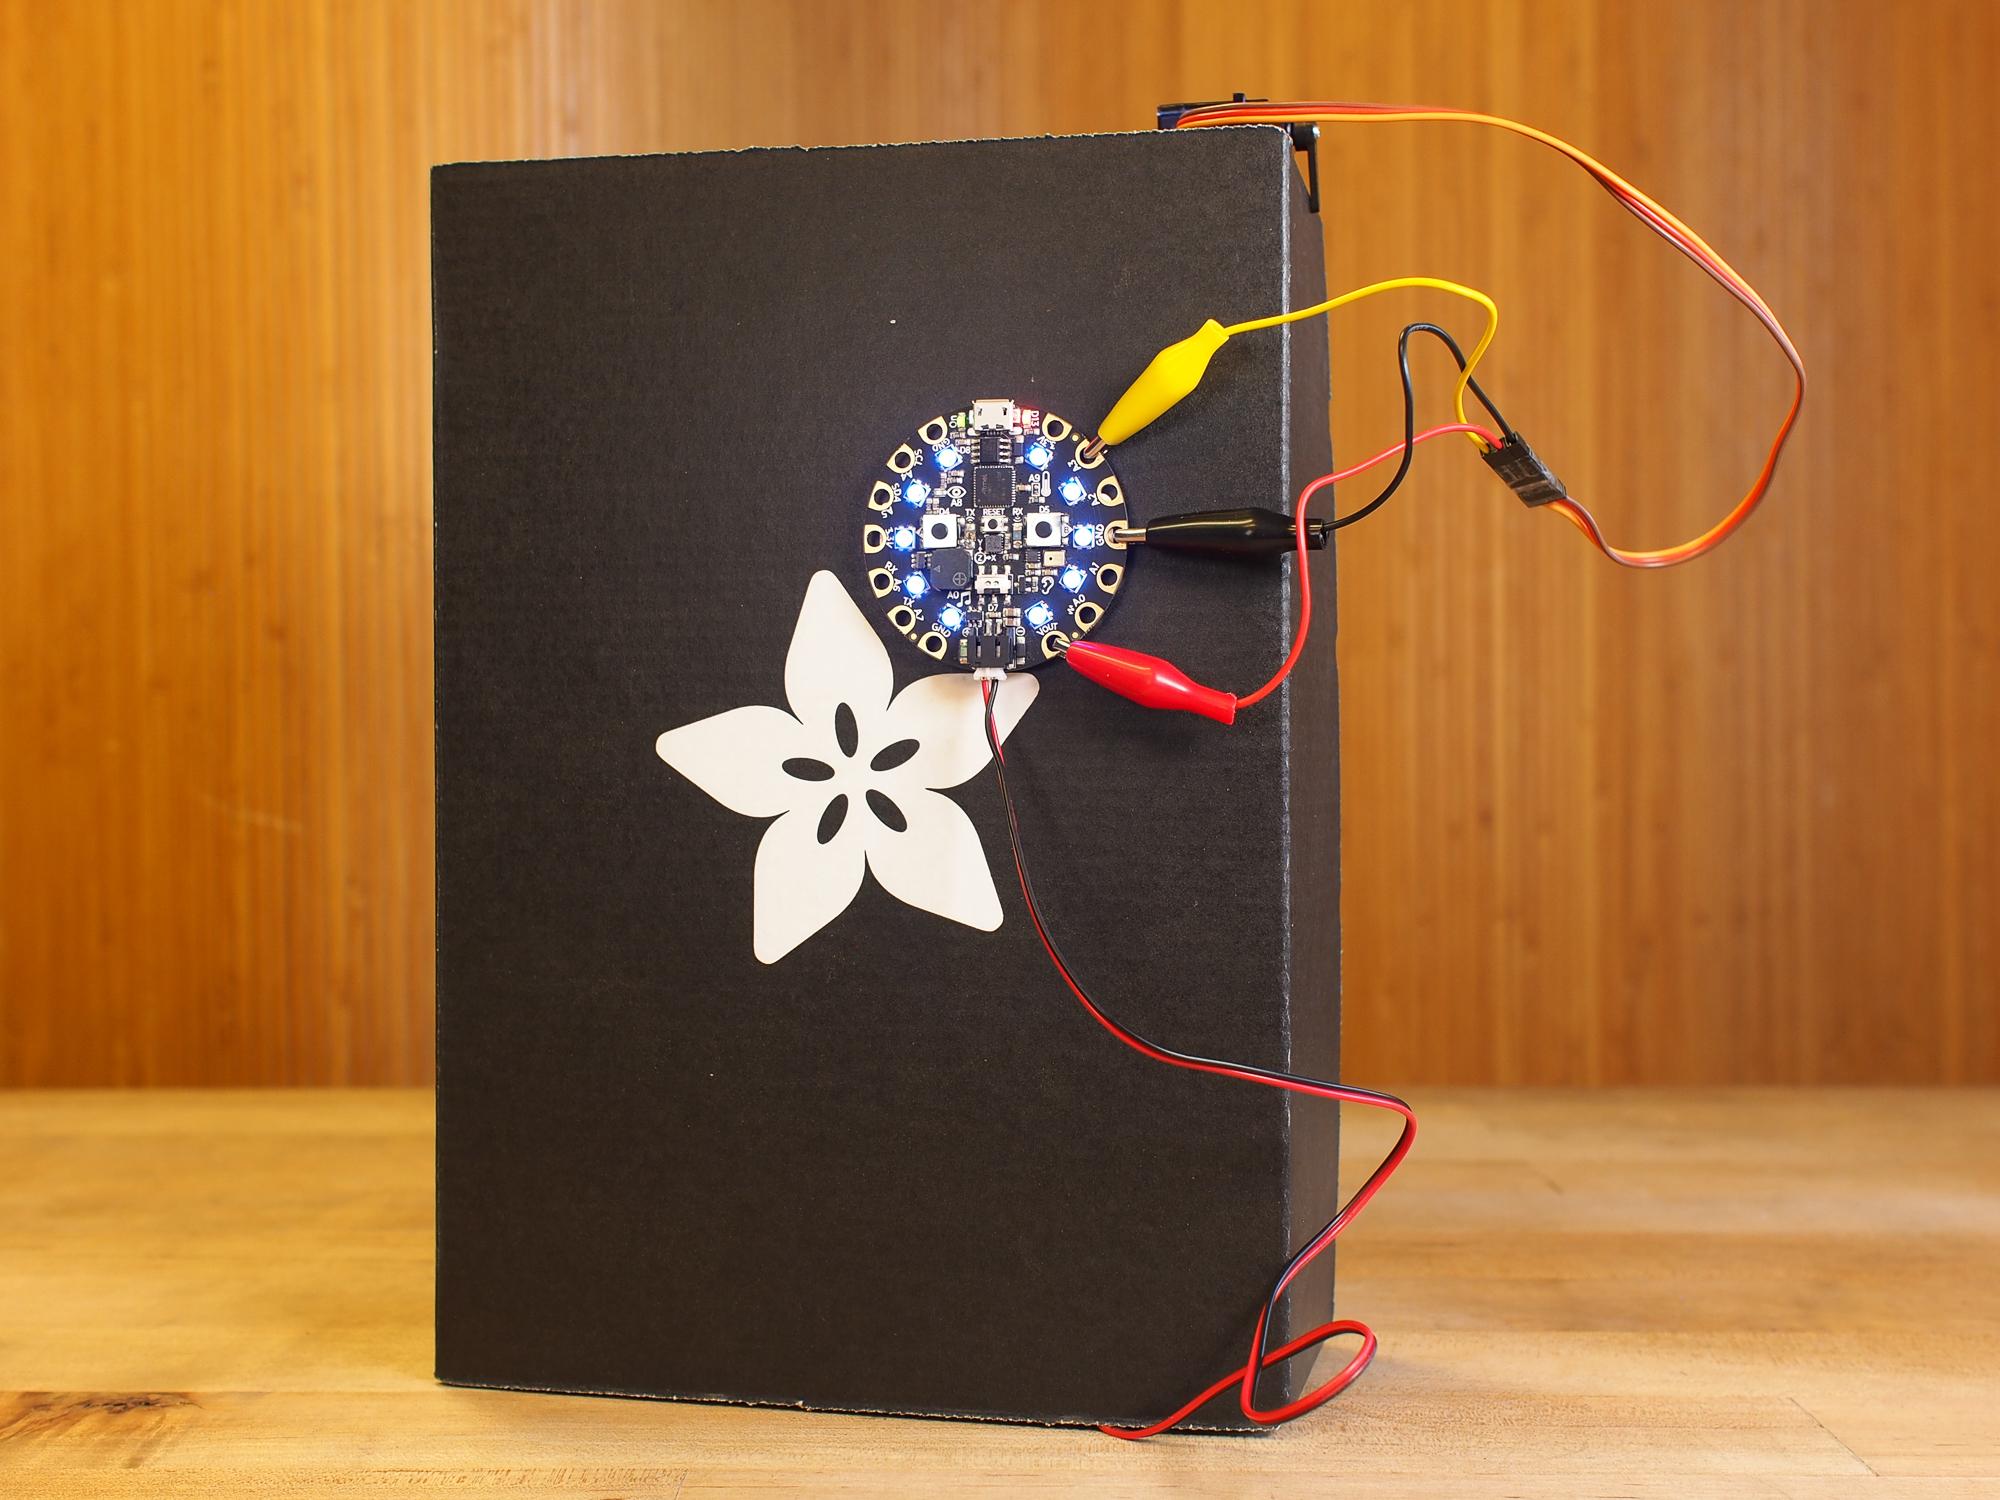 circuitpython_PC080522_2k.jpg